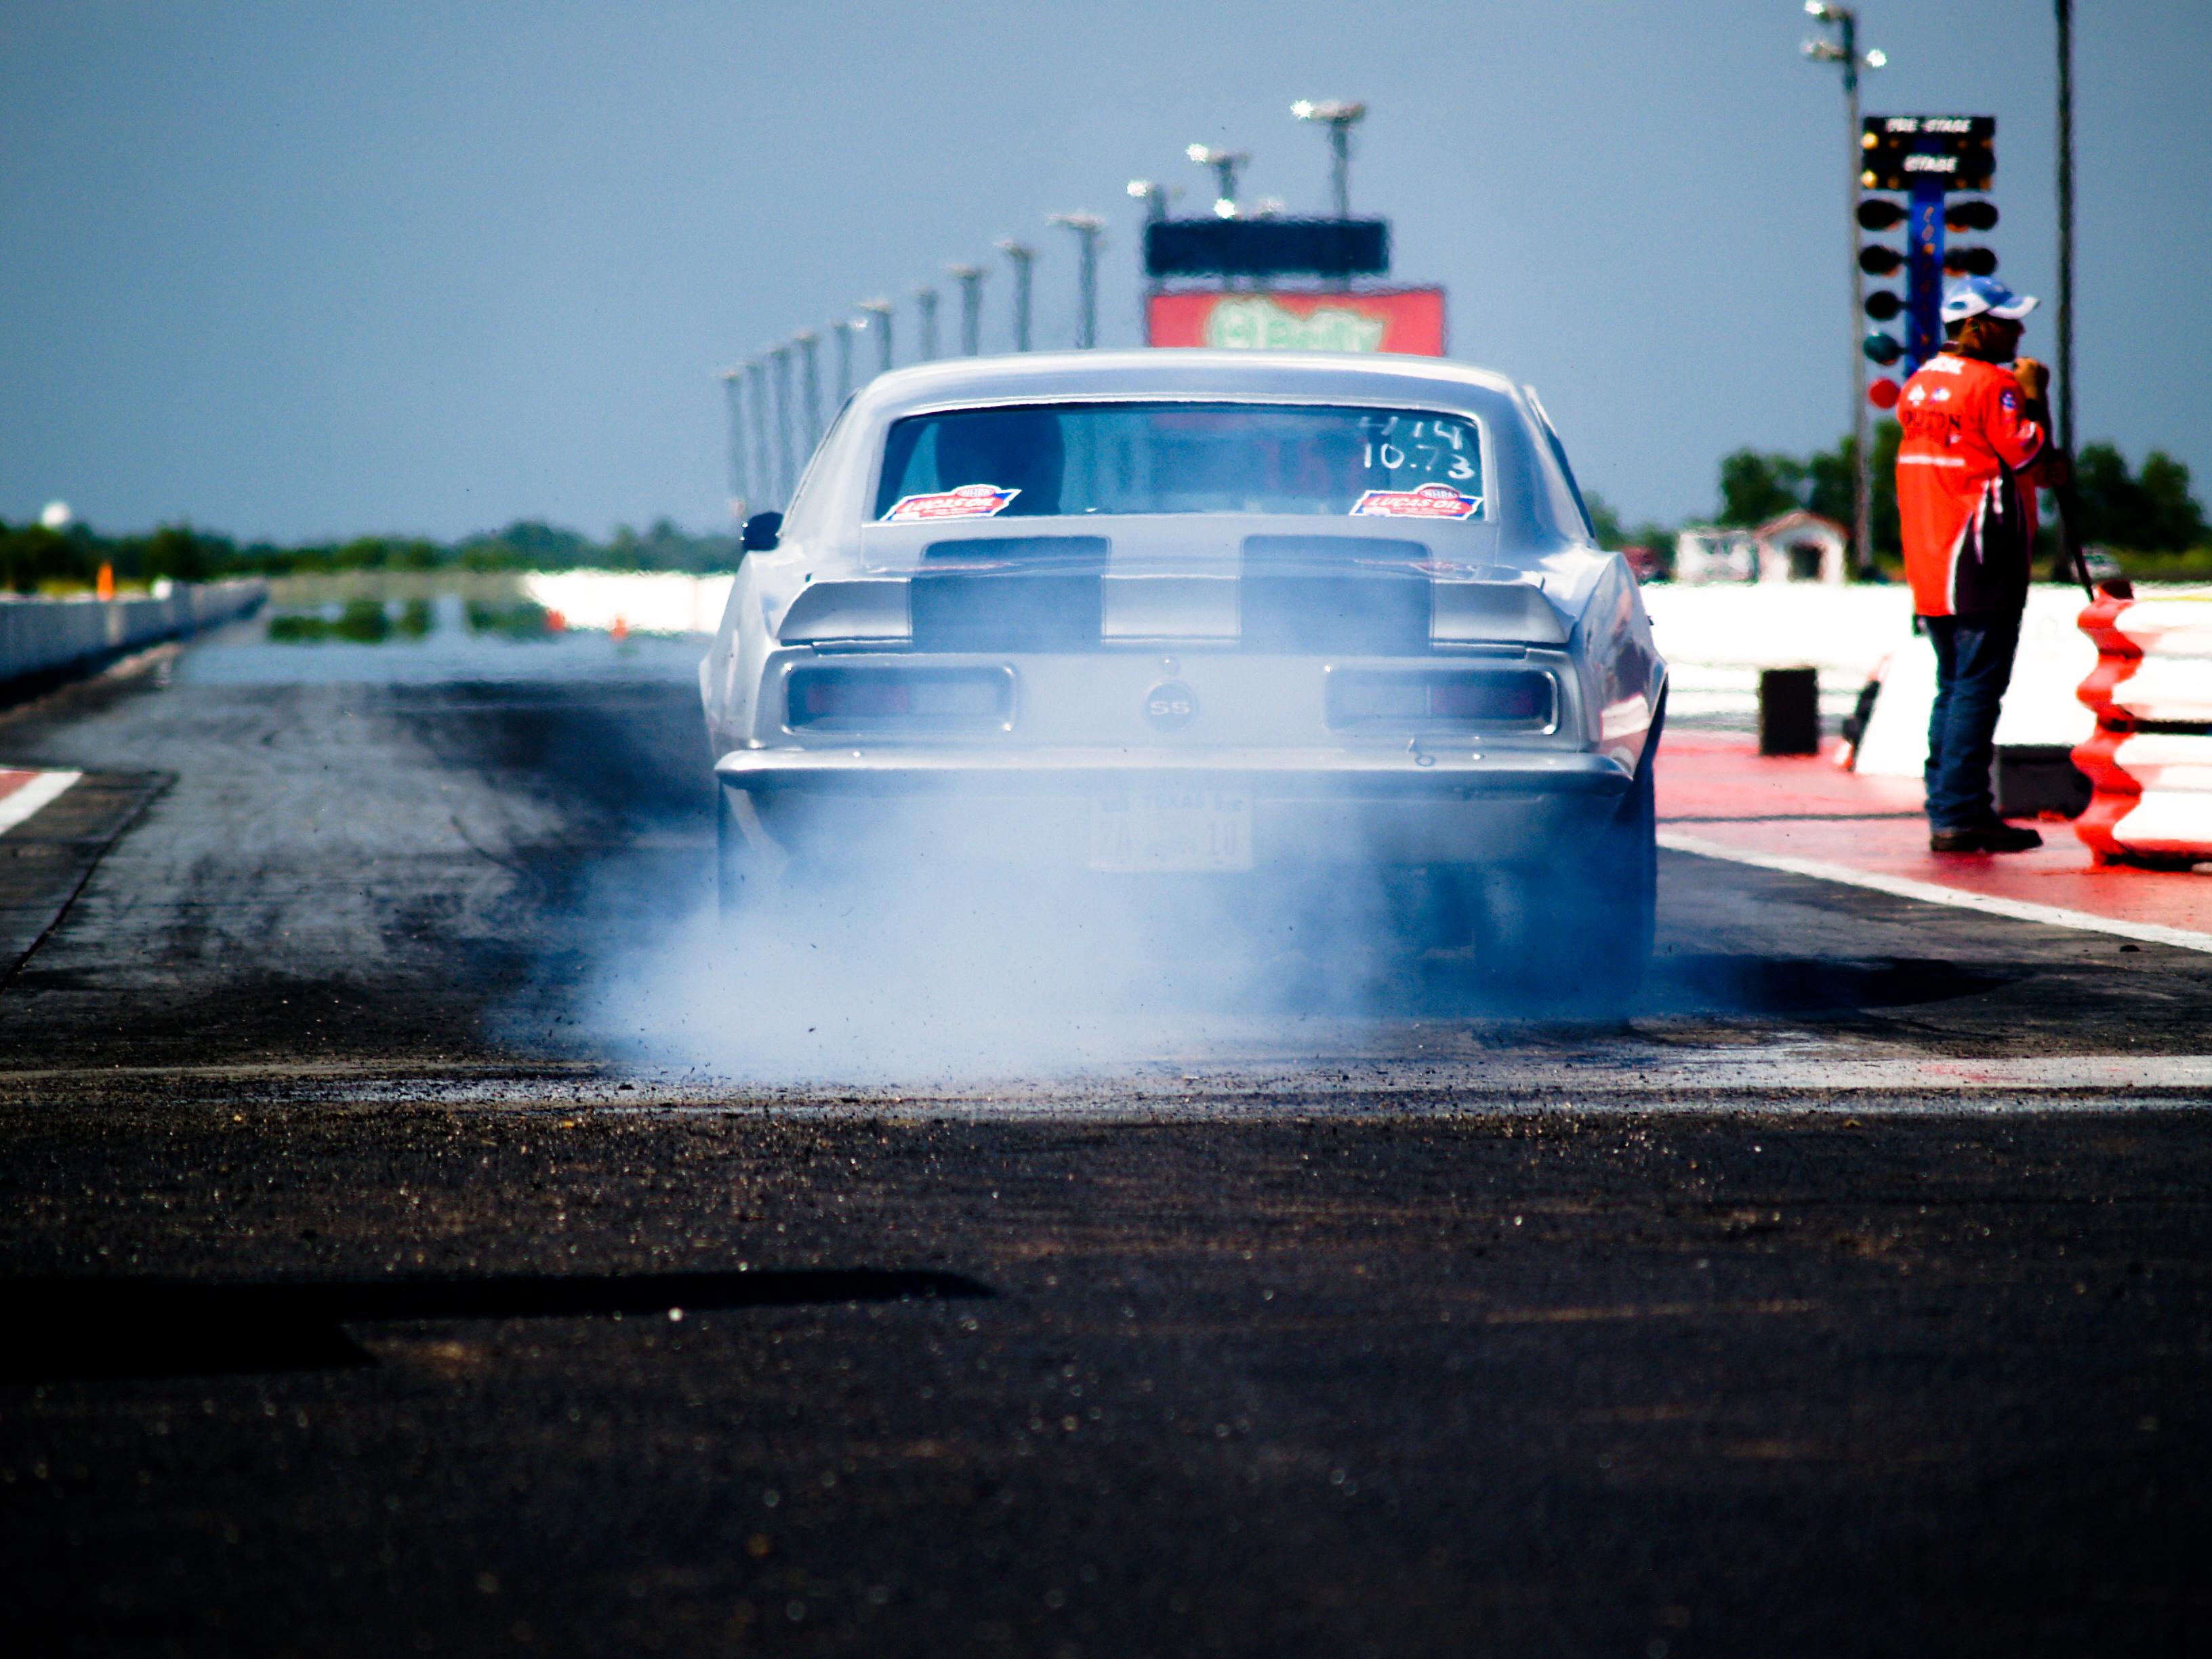 drag racing hd wallpaper background image 3264x2448